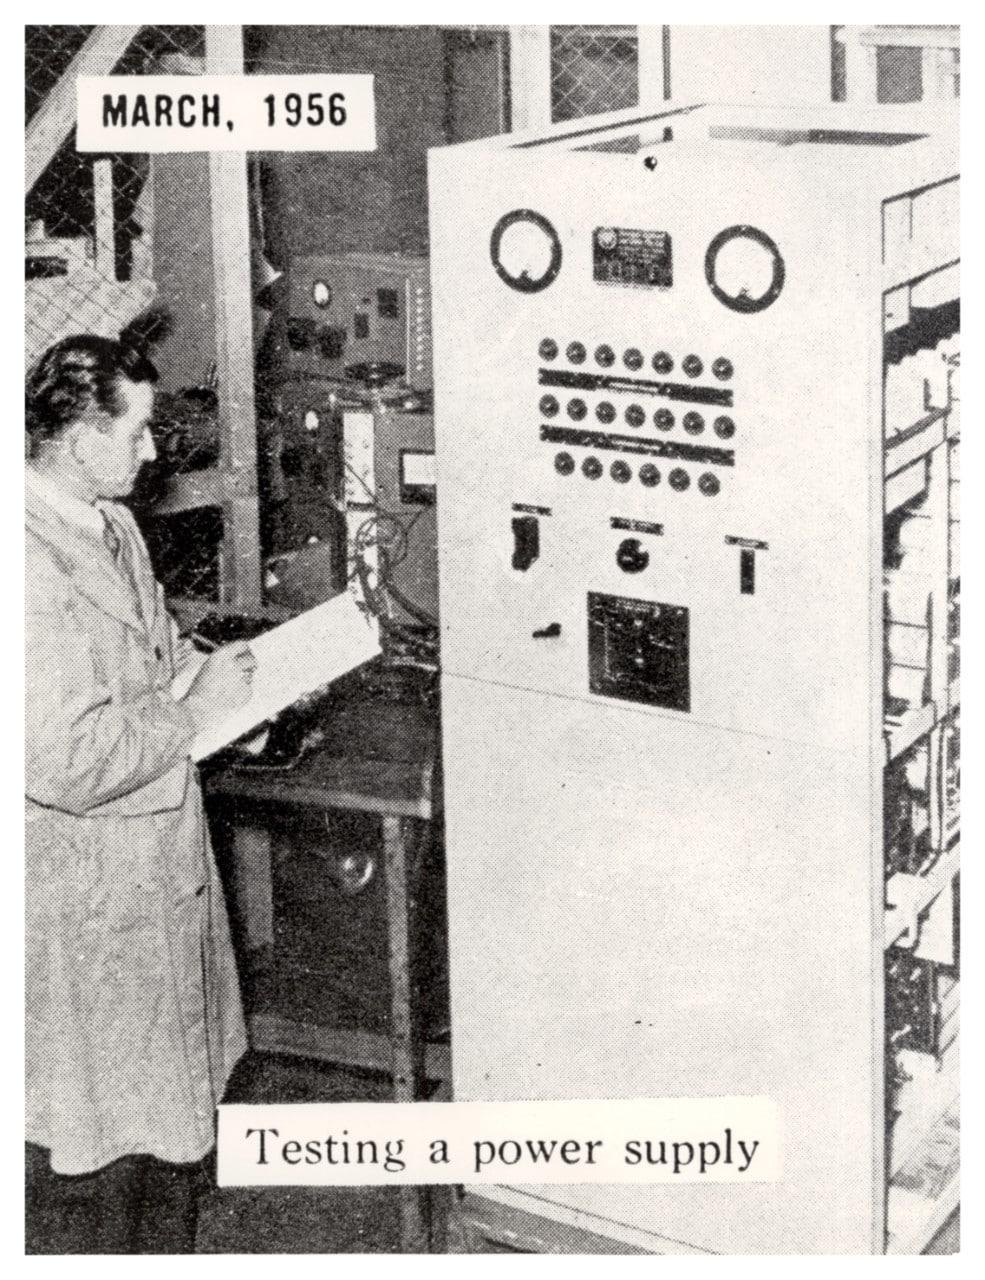 A man operating the SILLIAC computer